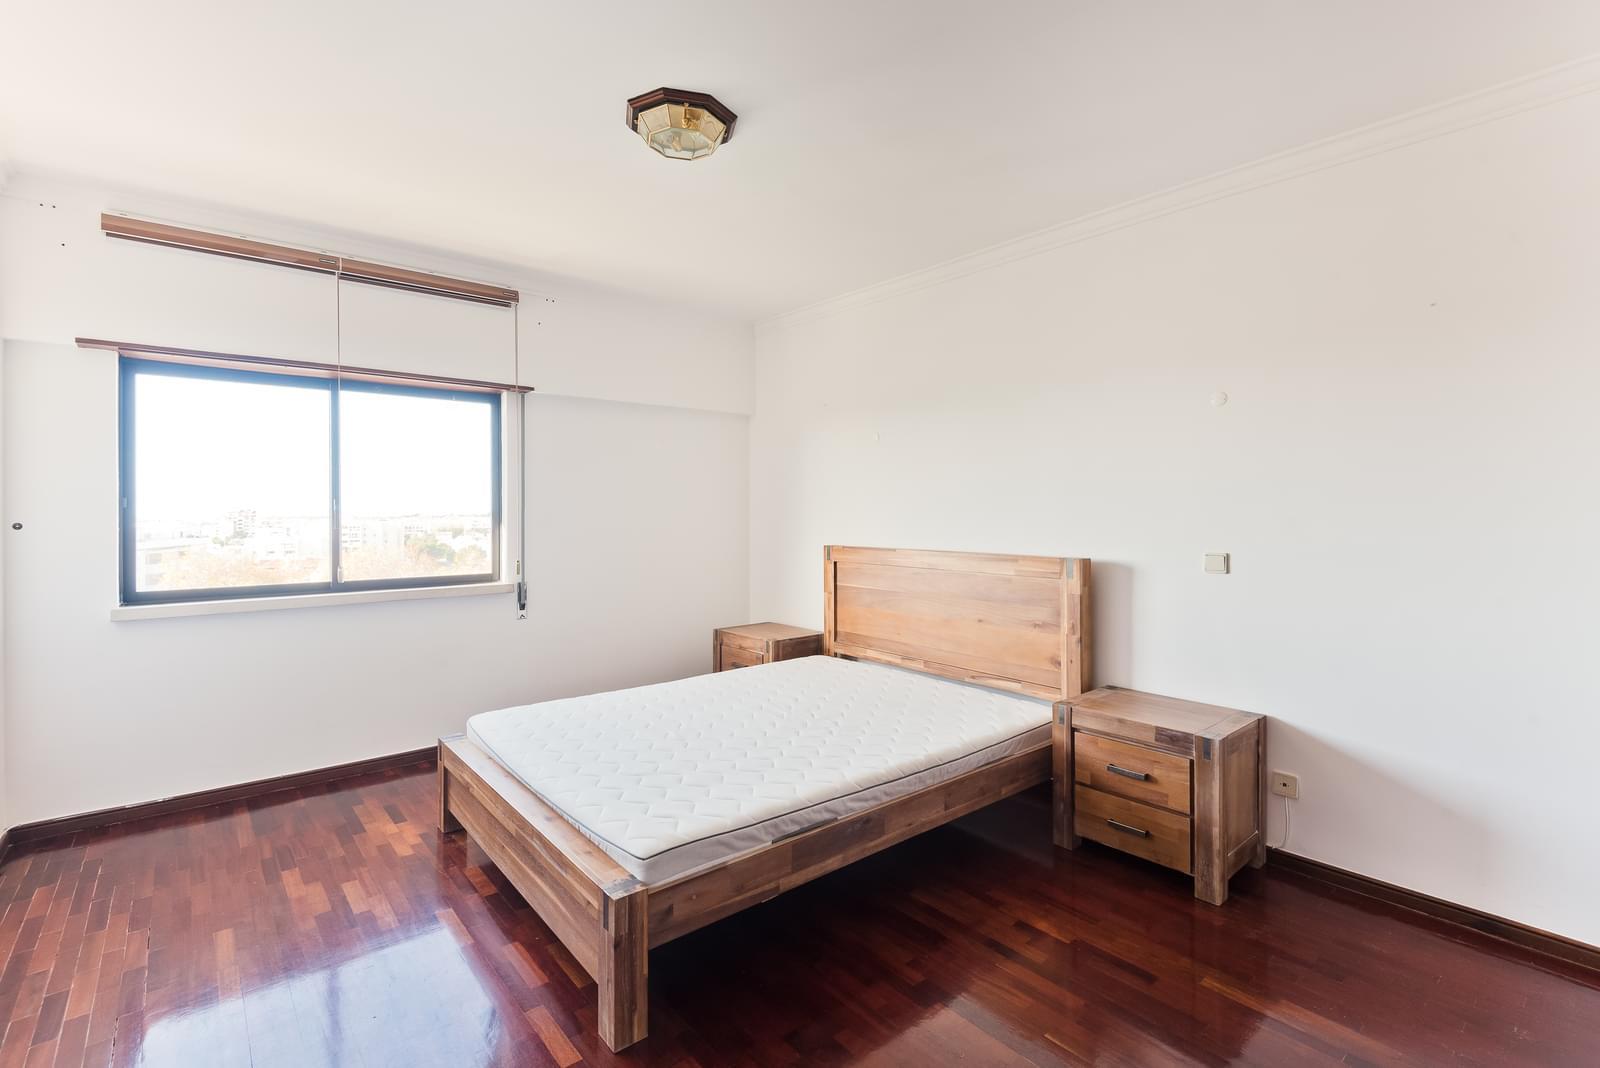 pf18730-apartamento-t2-cascais-958d61c3-fe46-4b9e-af04-26f6d95f89d1